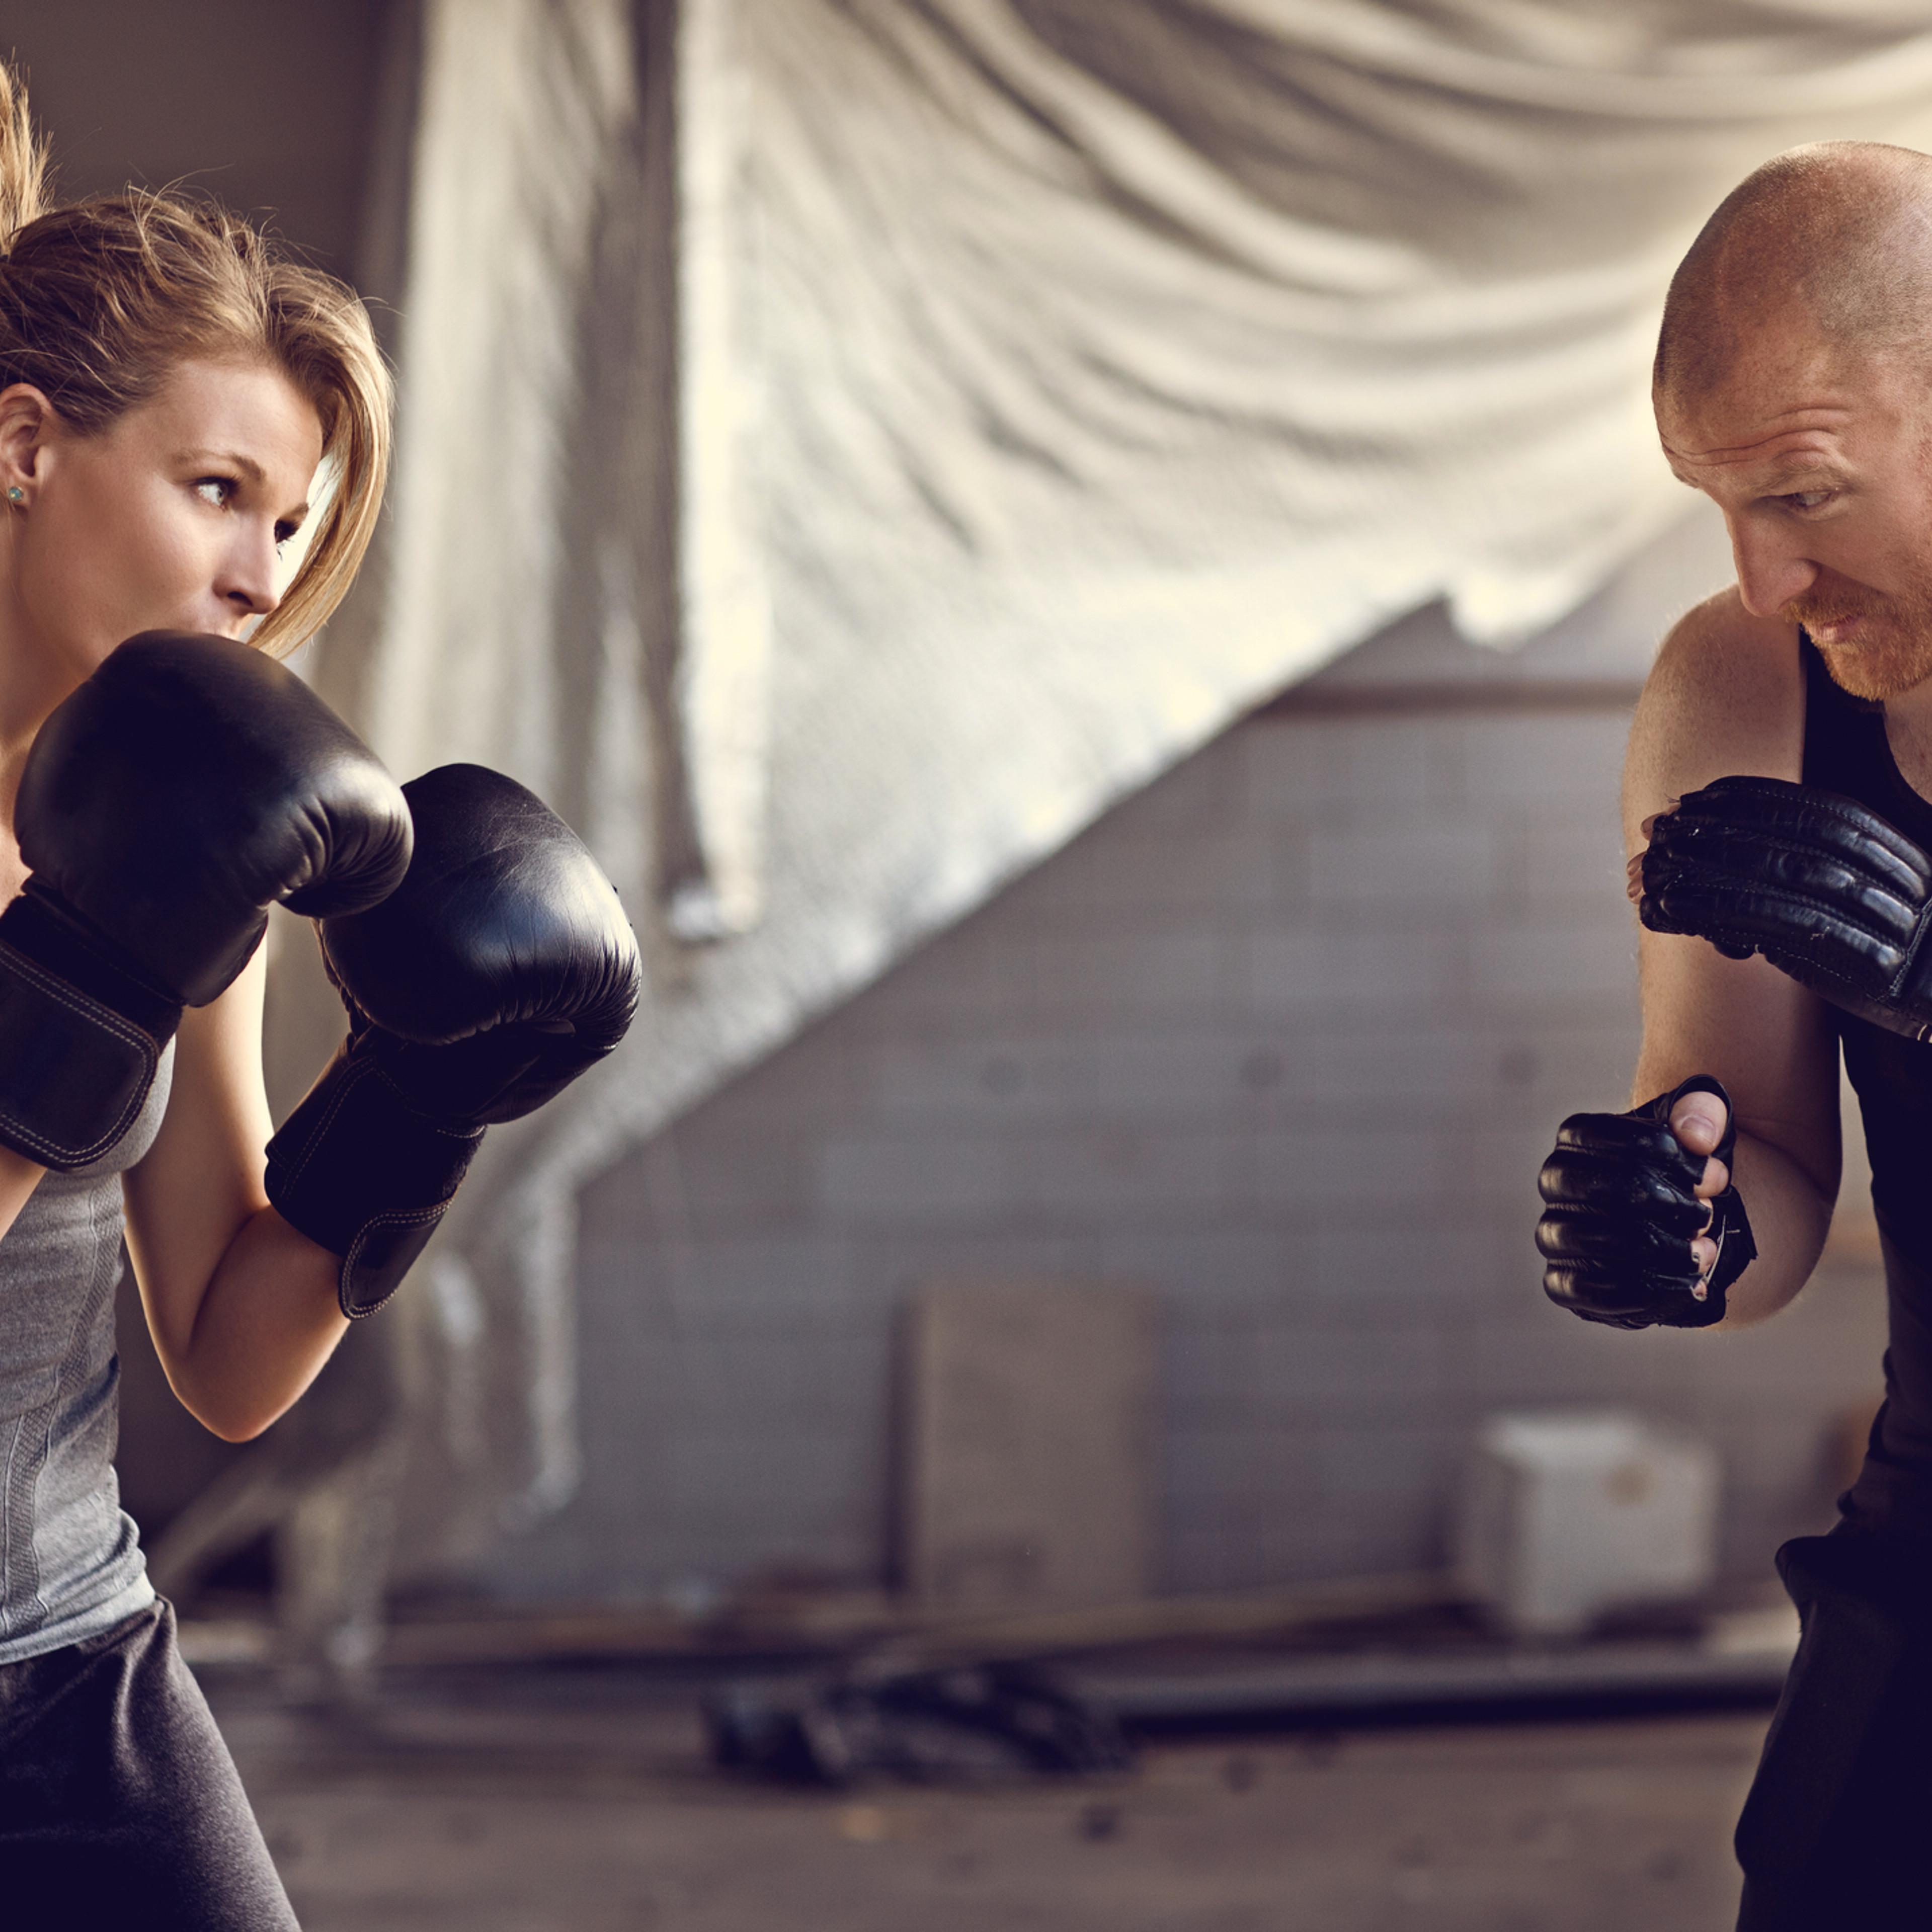 Martial Art Technique